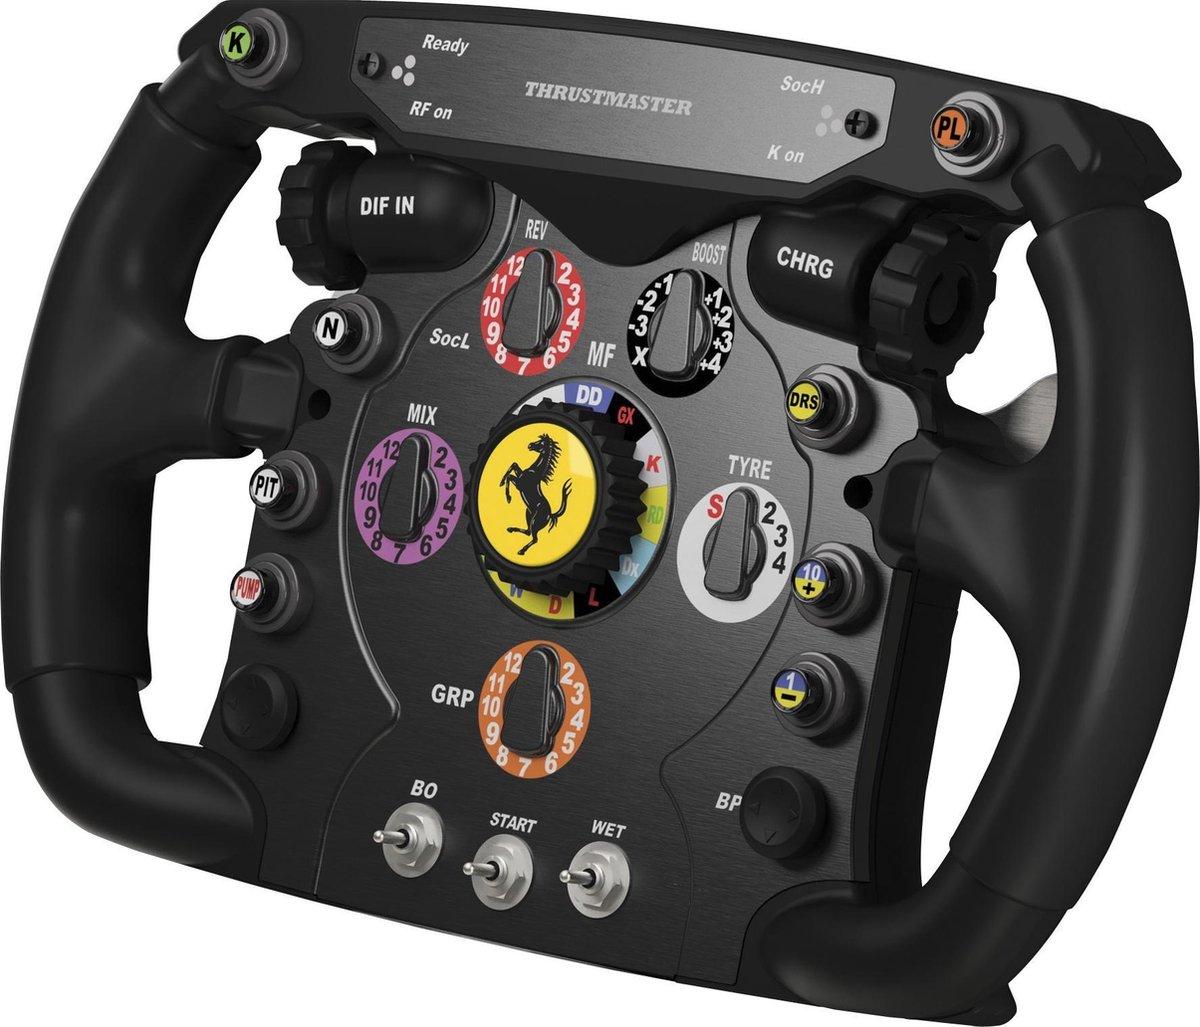 Thrustmaster Ferrari F1 Racestuur - Add-On PS4 + PS3 + Xbox One + PC